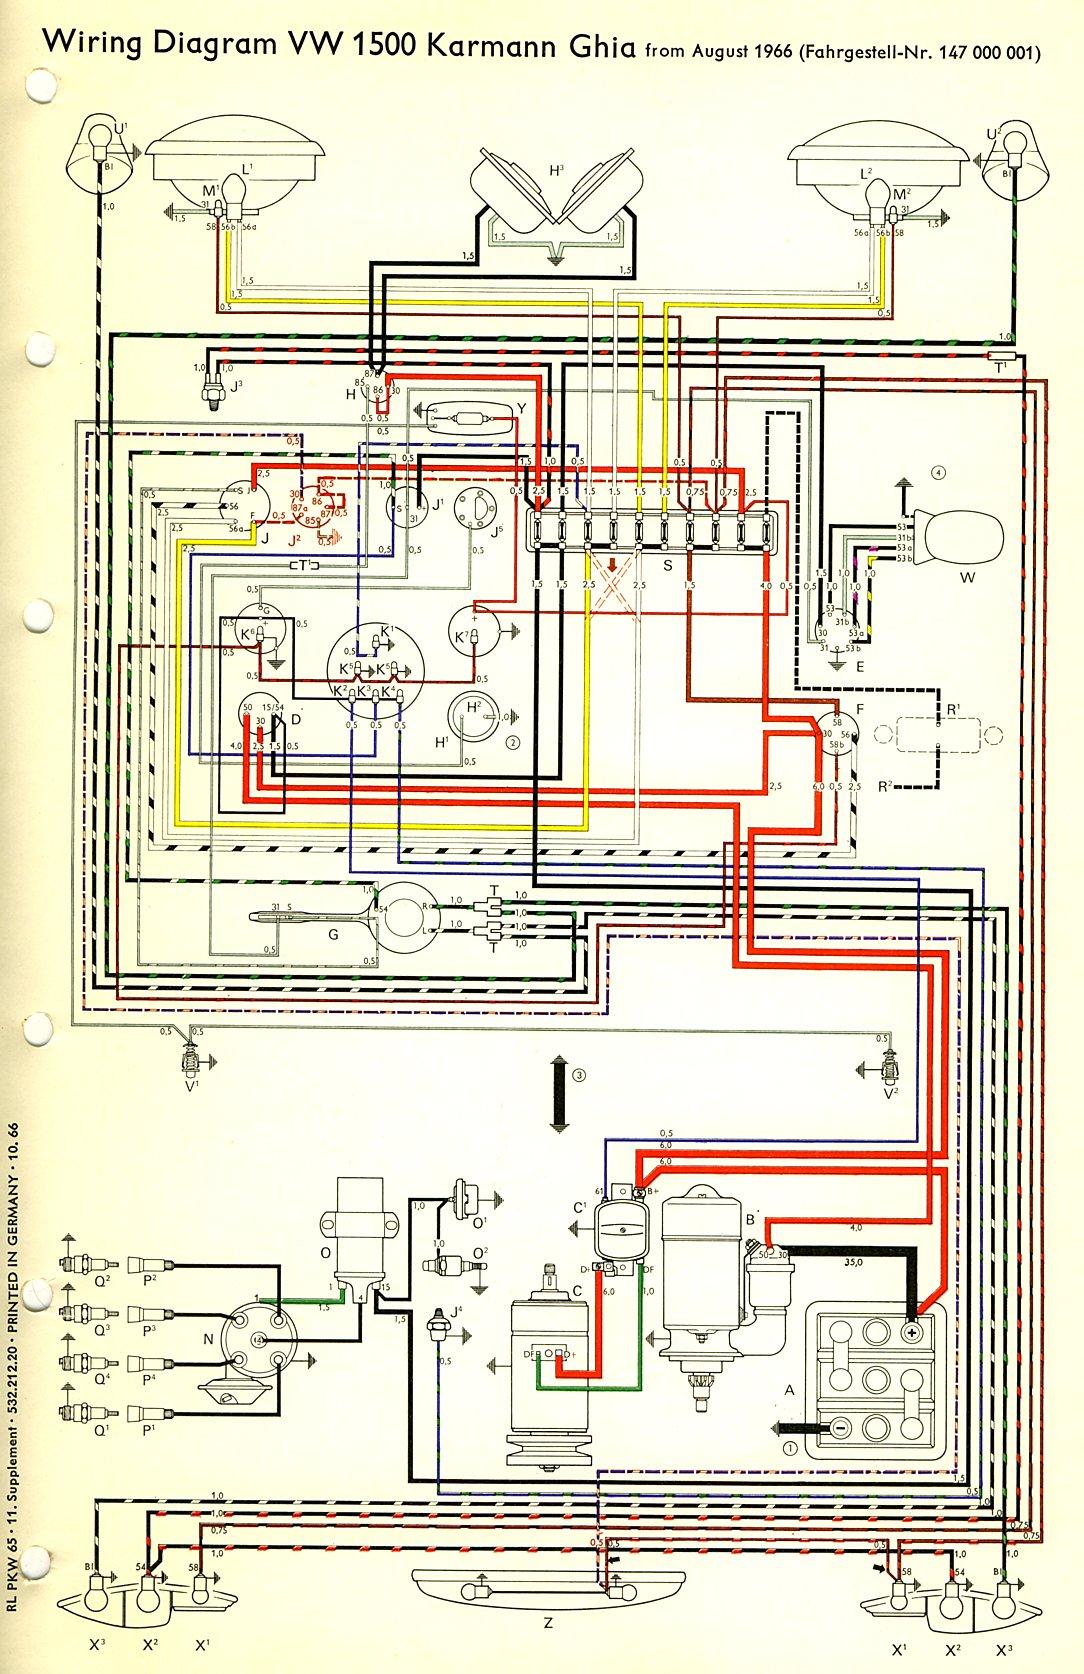 69 Jeep Cj5 Wiring - Wiring Diagram Networks